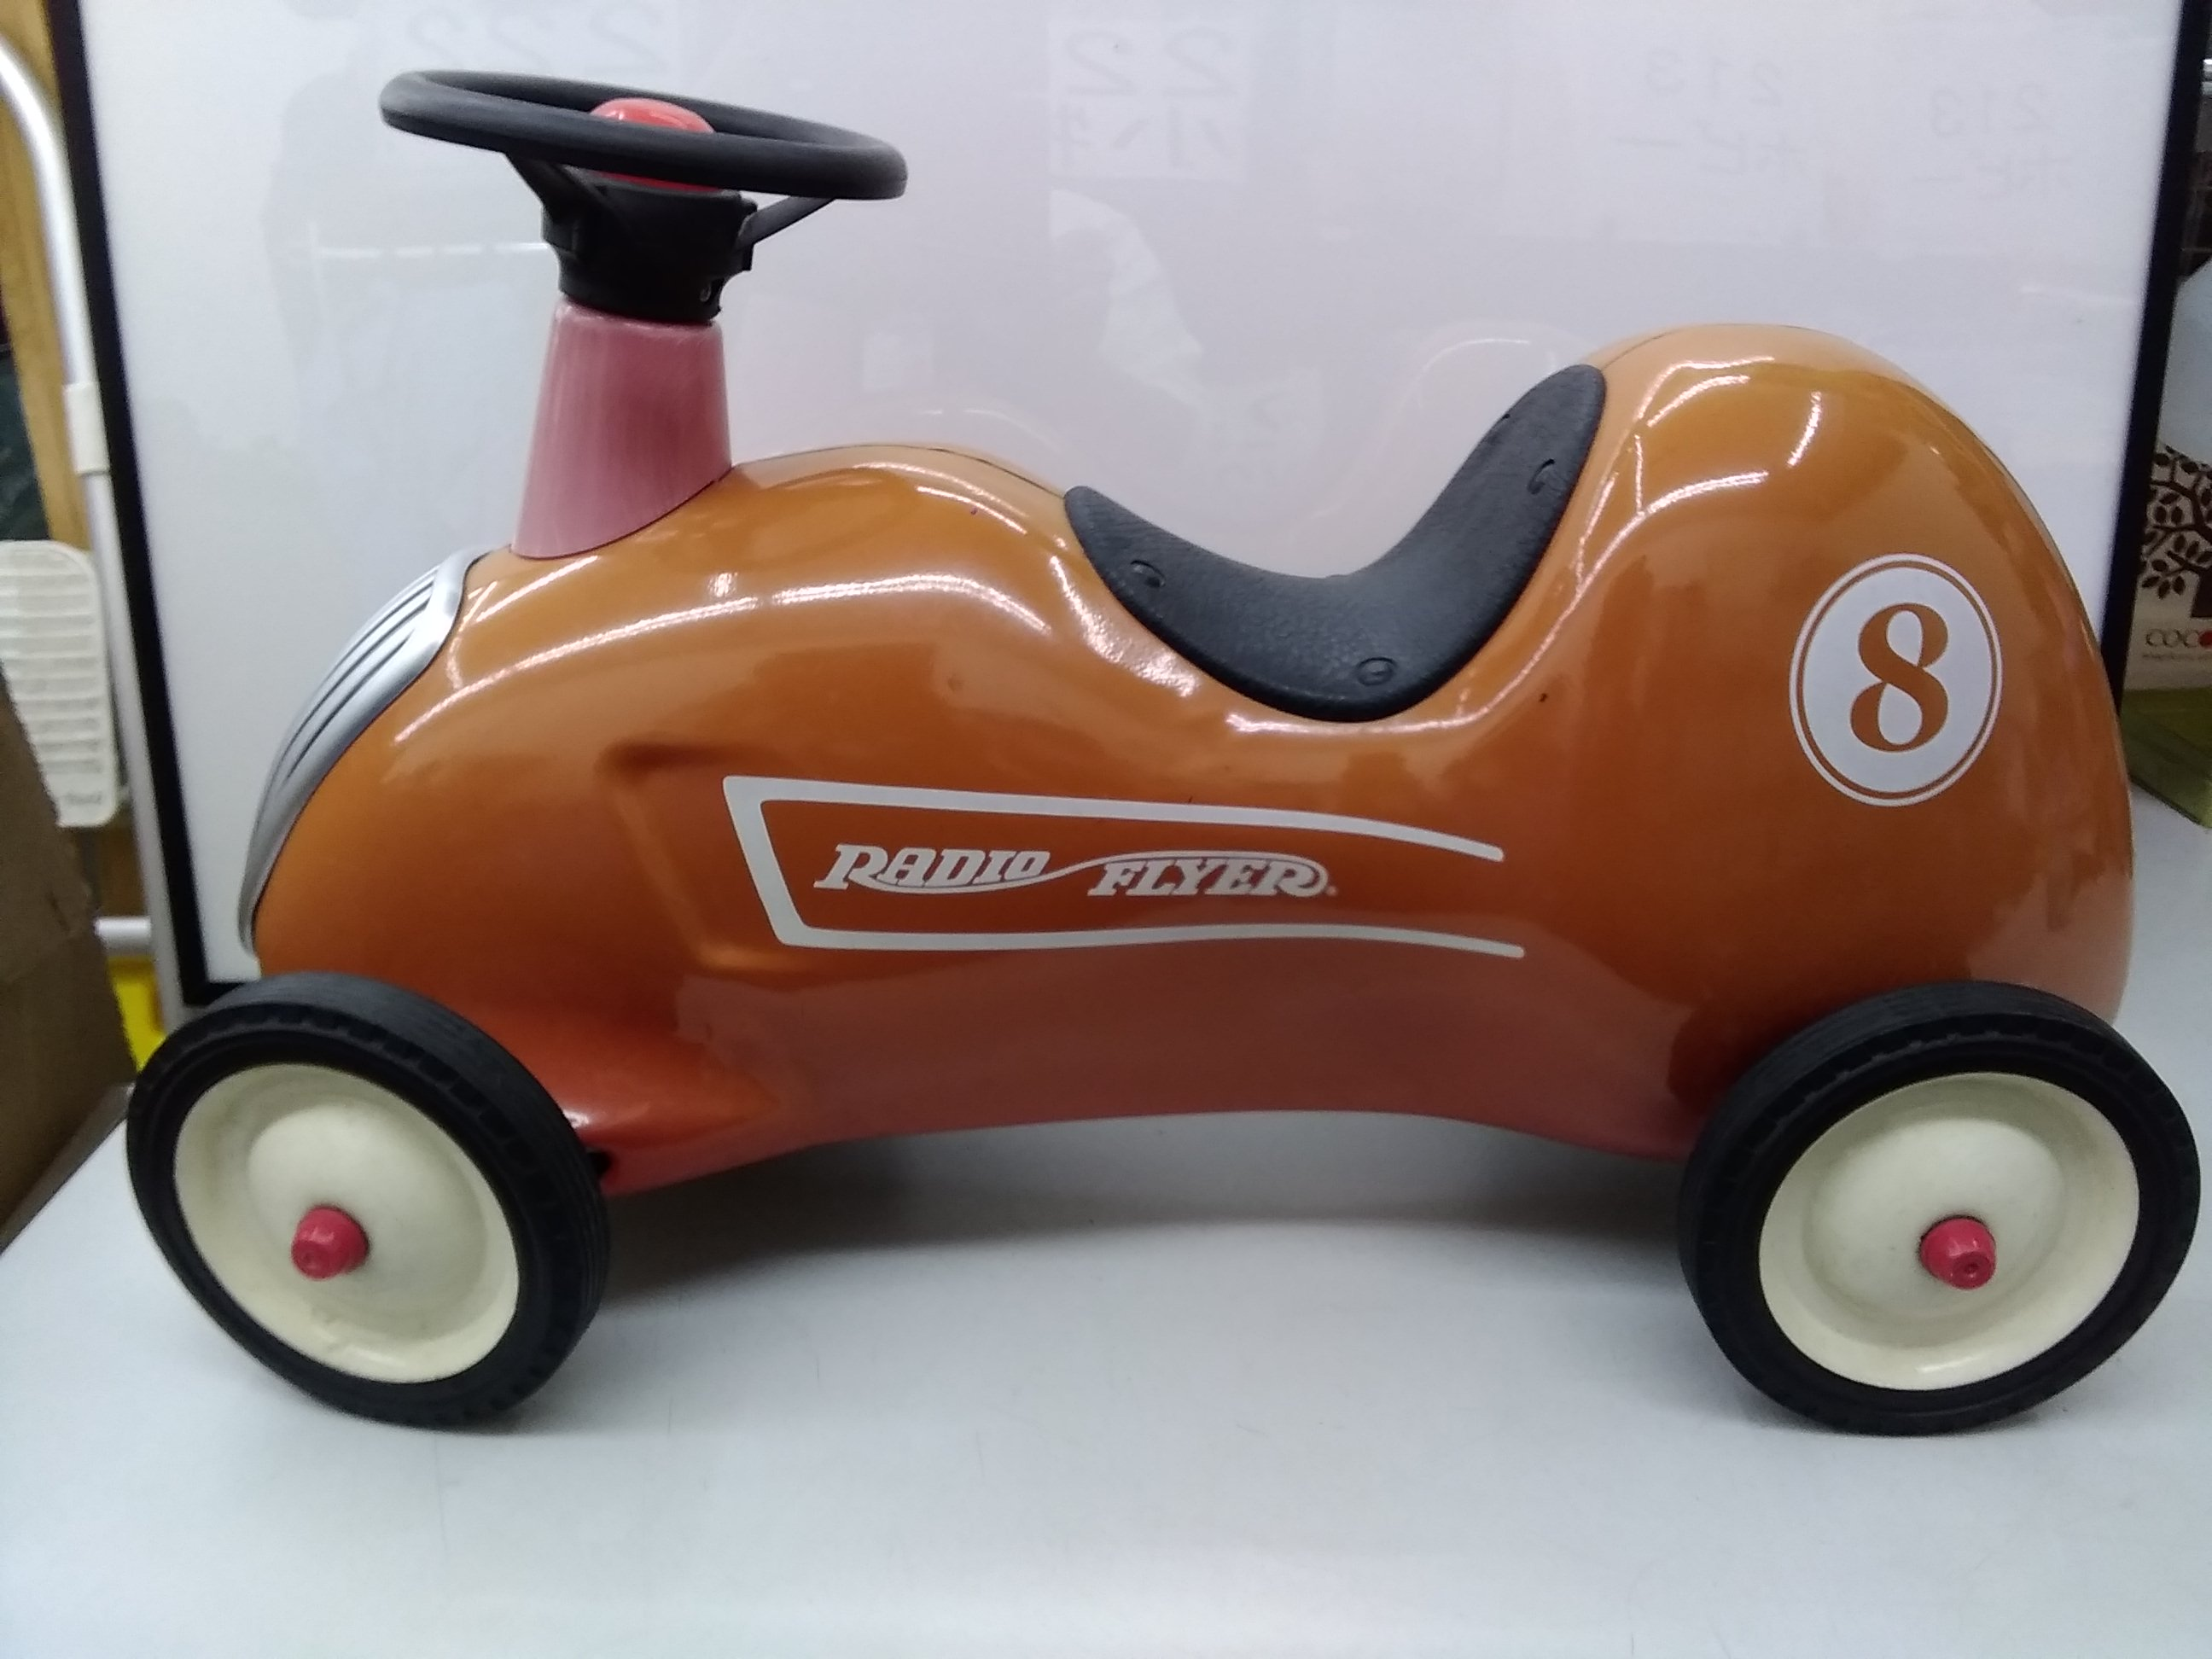 乗用玩具・三輪車 RADIO FLYER